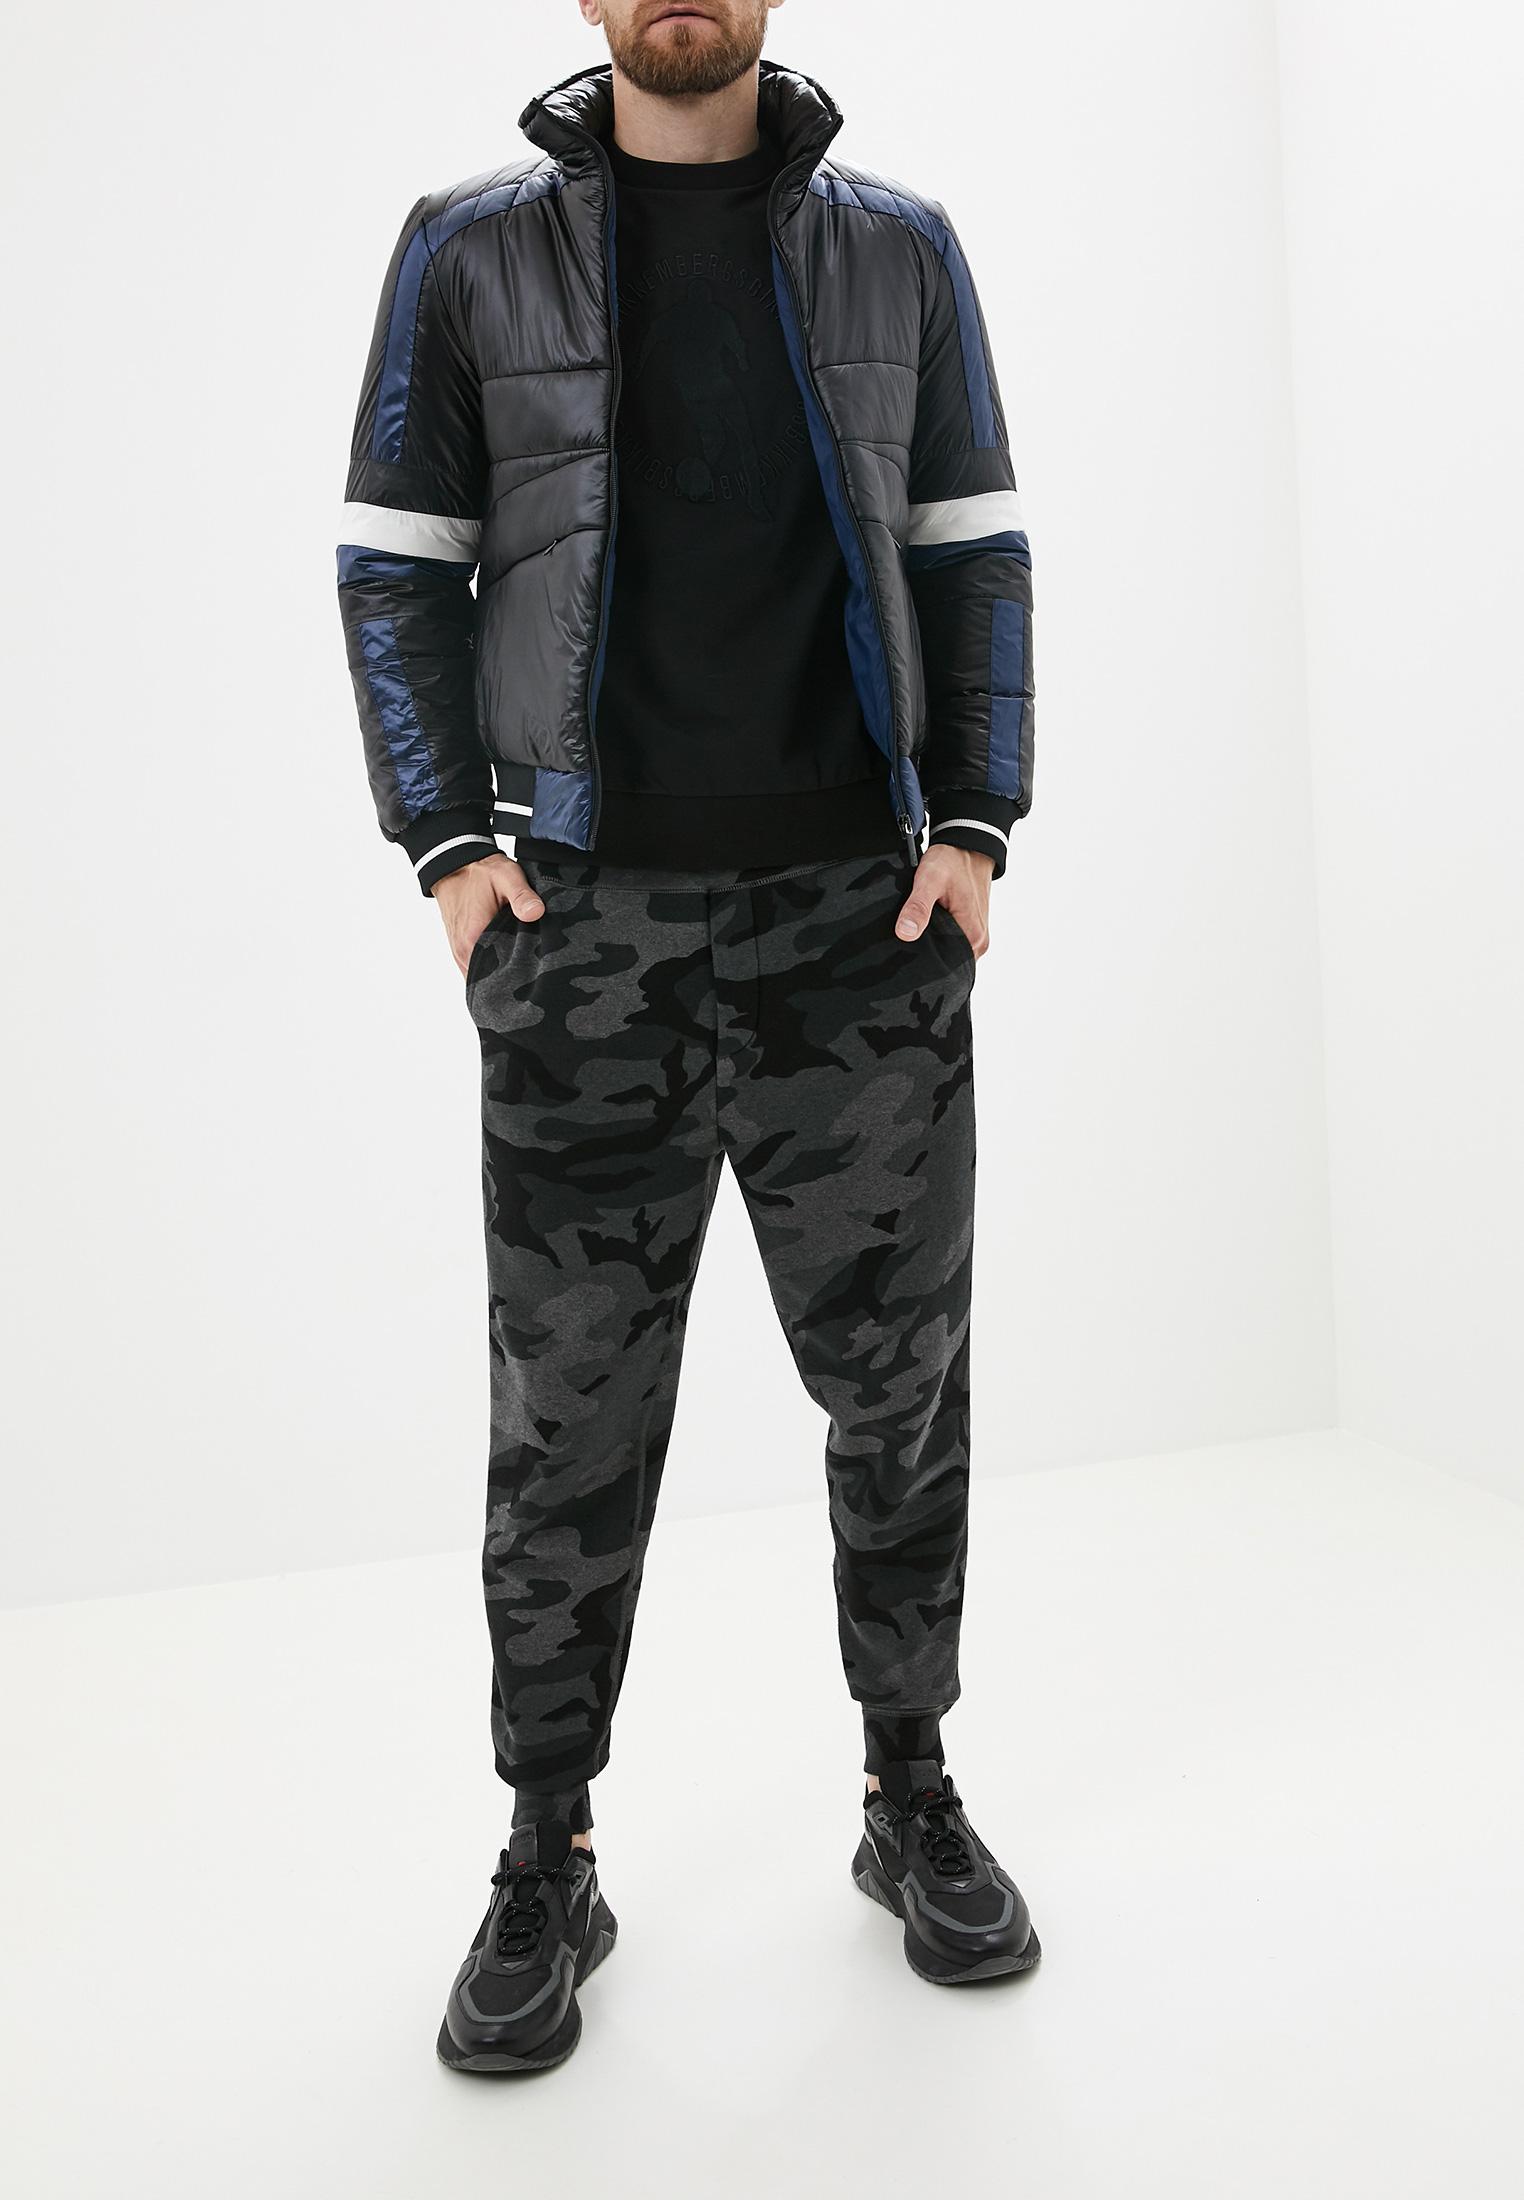 Мужская куртка Bikkembergs (Биккембергс) C H 082 01 T 9846: изображение 2